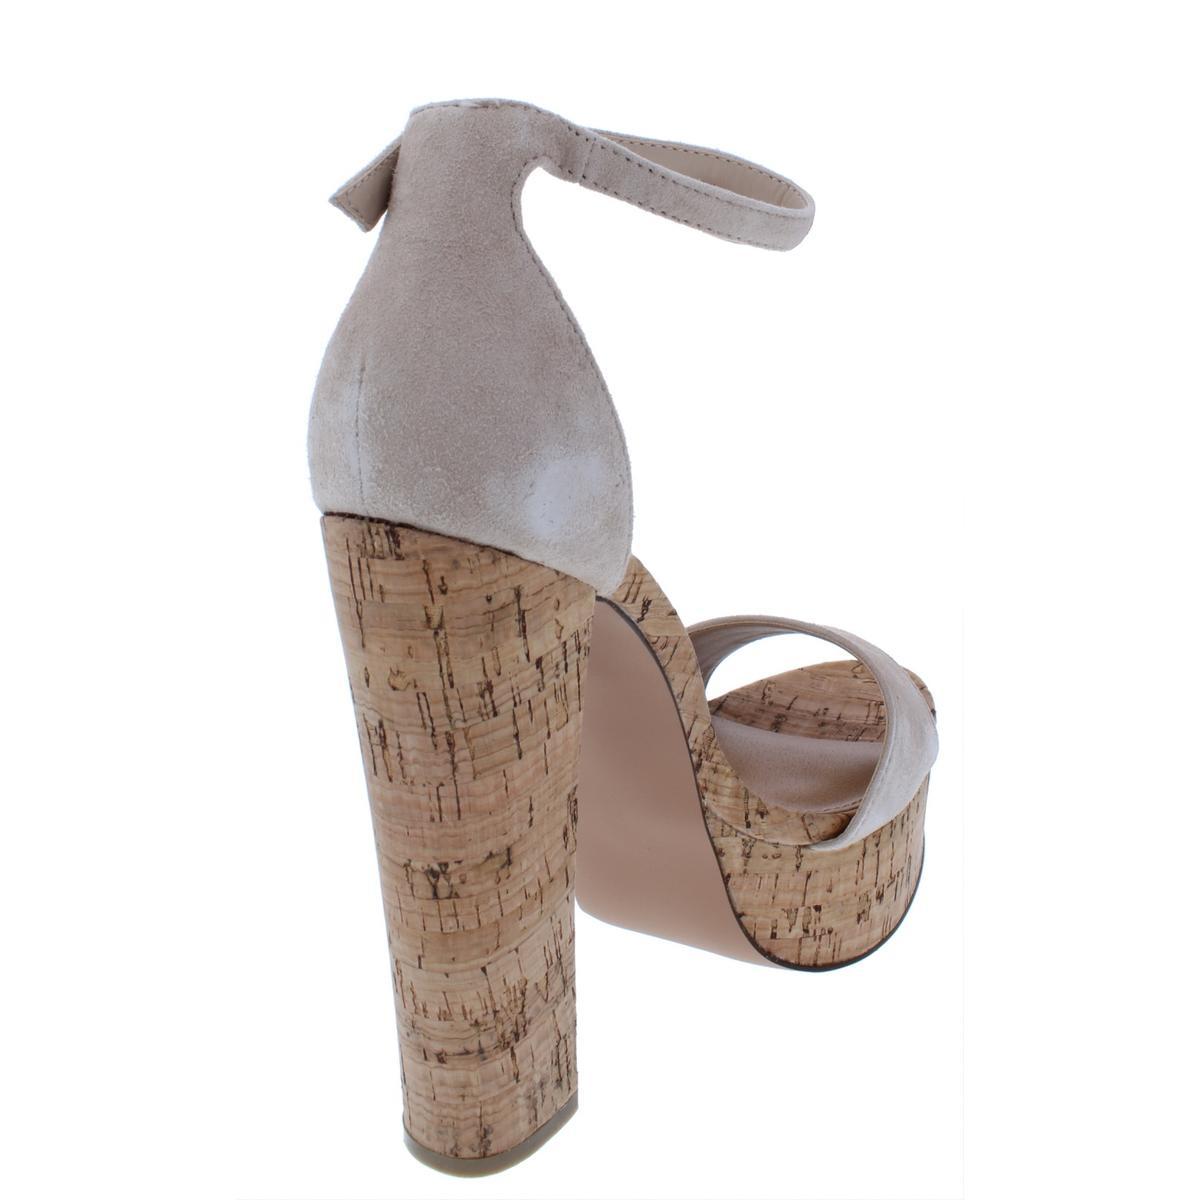 Steve-Madden-Womens-Gonzo-Platform-Block-Heel-Dress-Sandals-Shoes-BHFO-2458 thumbnail 10